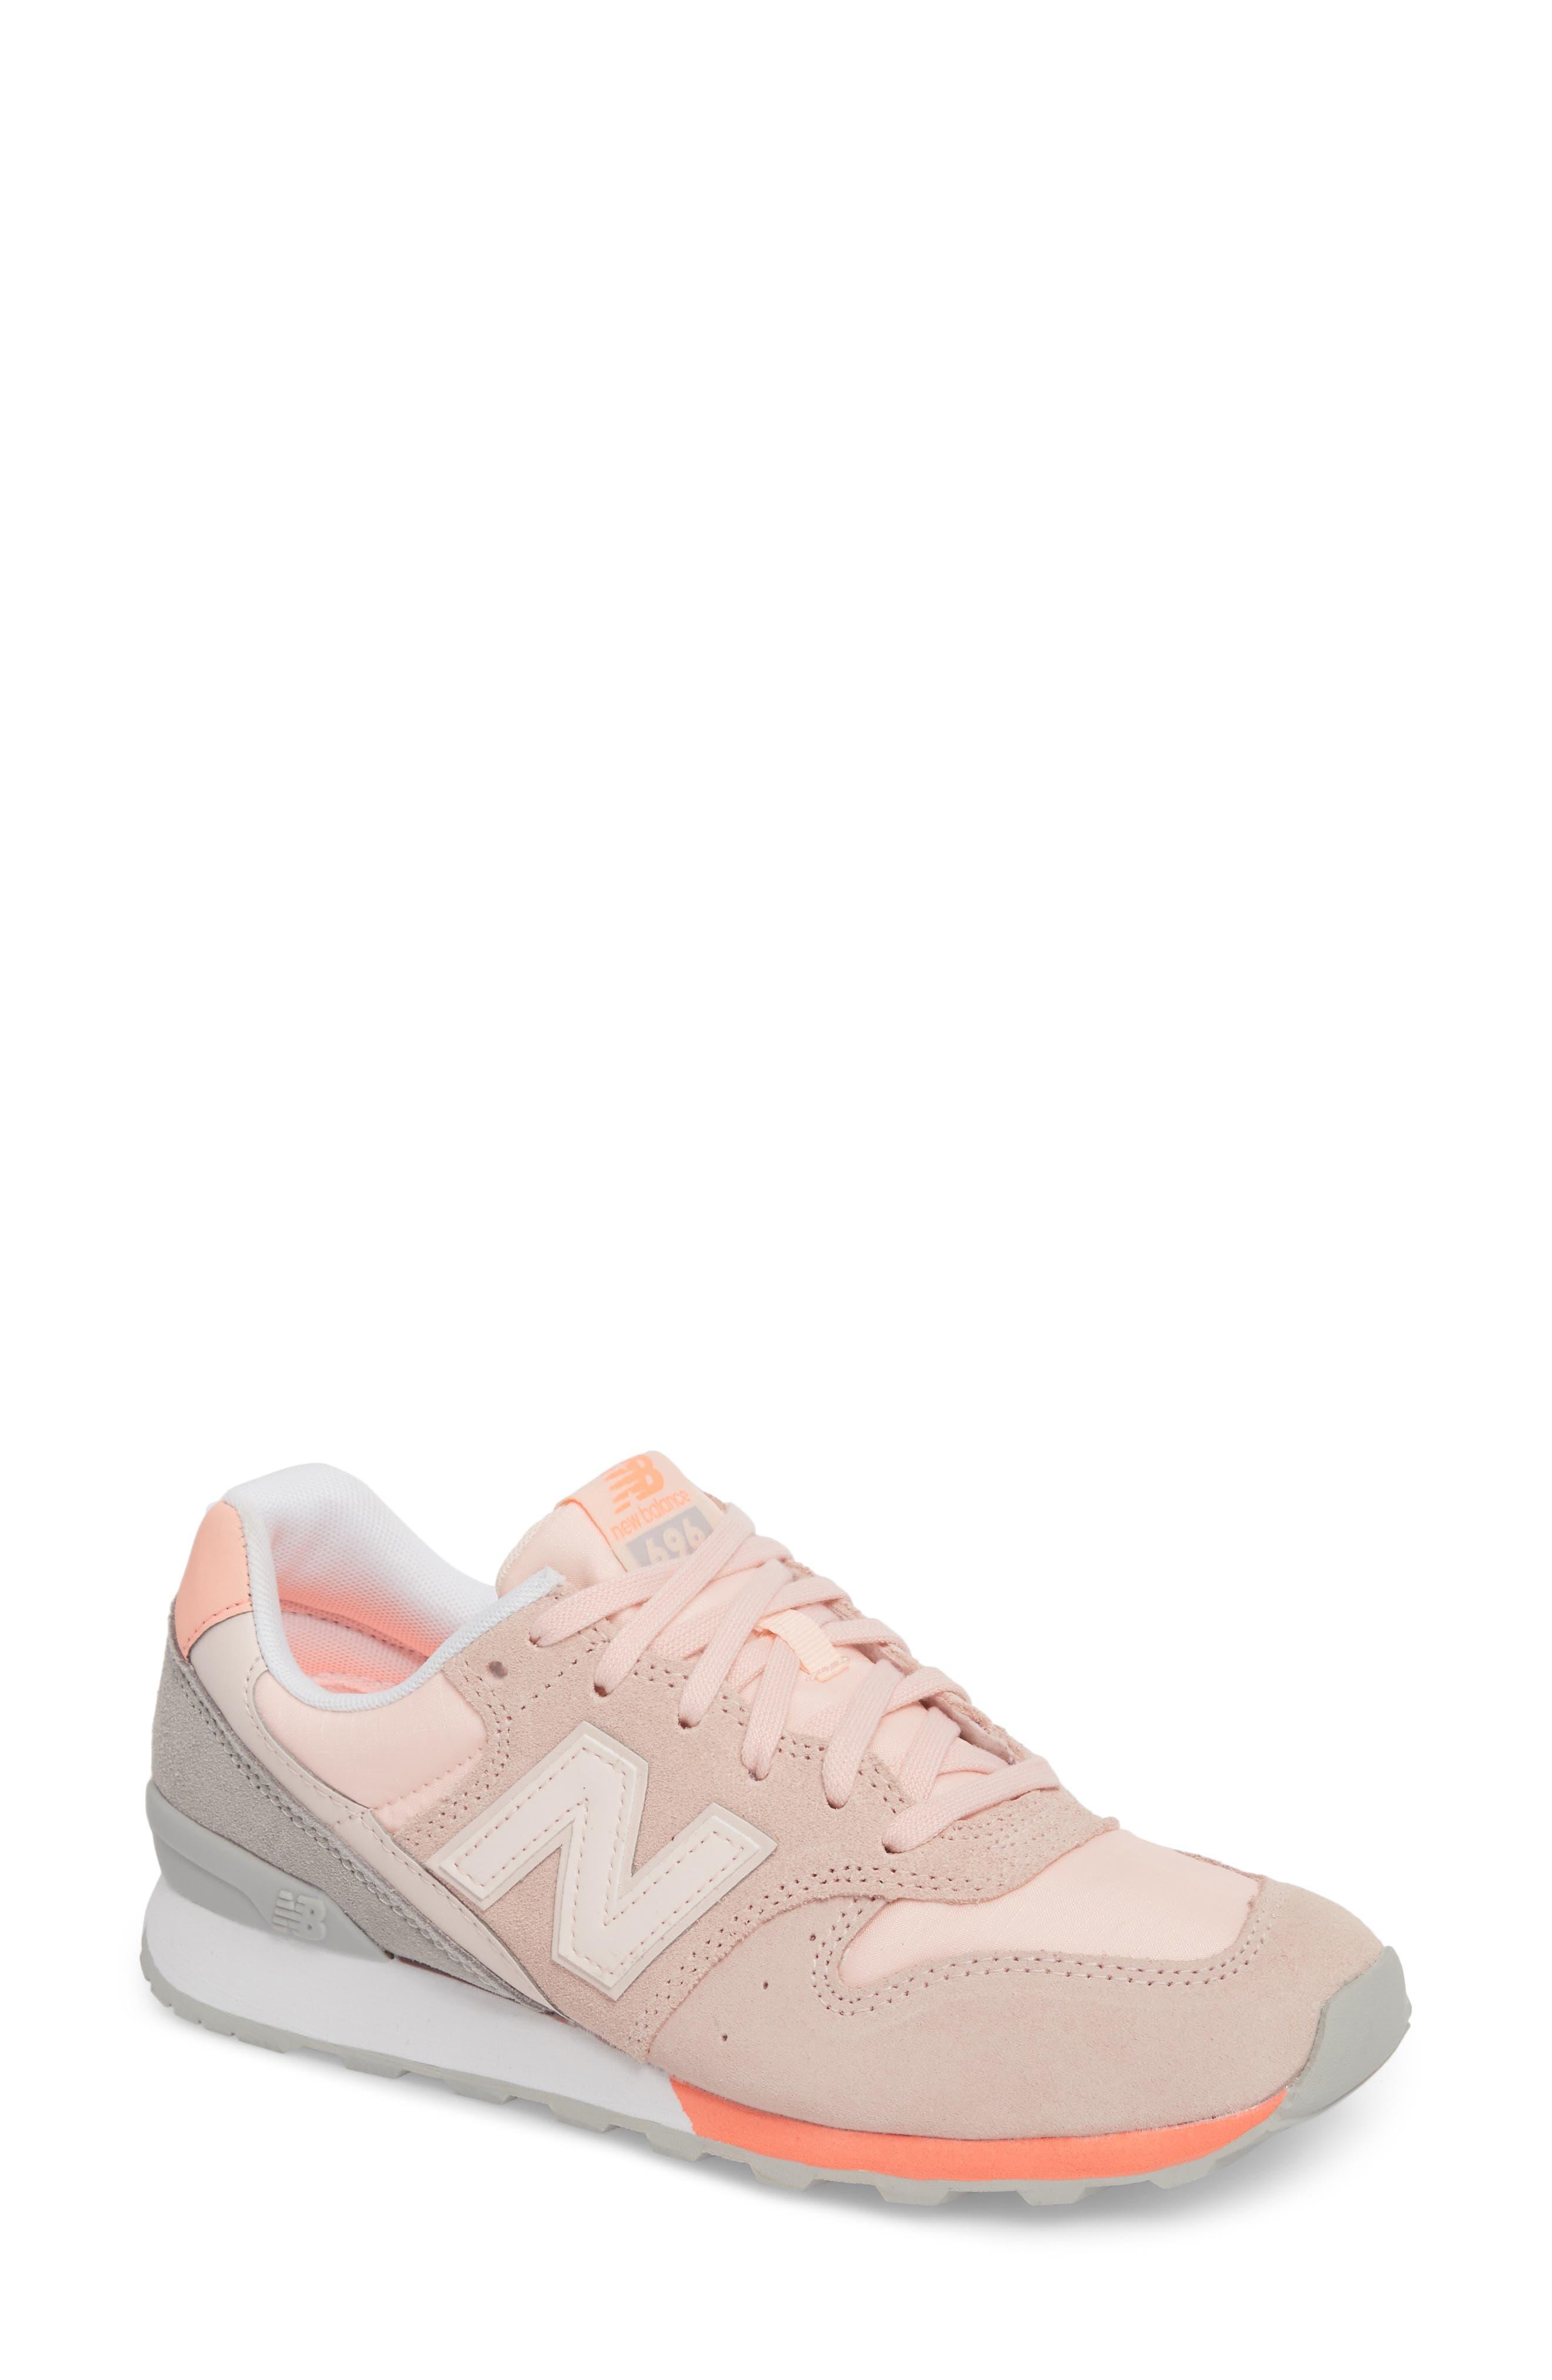 Main Image - New Balance 696 Suede Sneaker (Women)